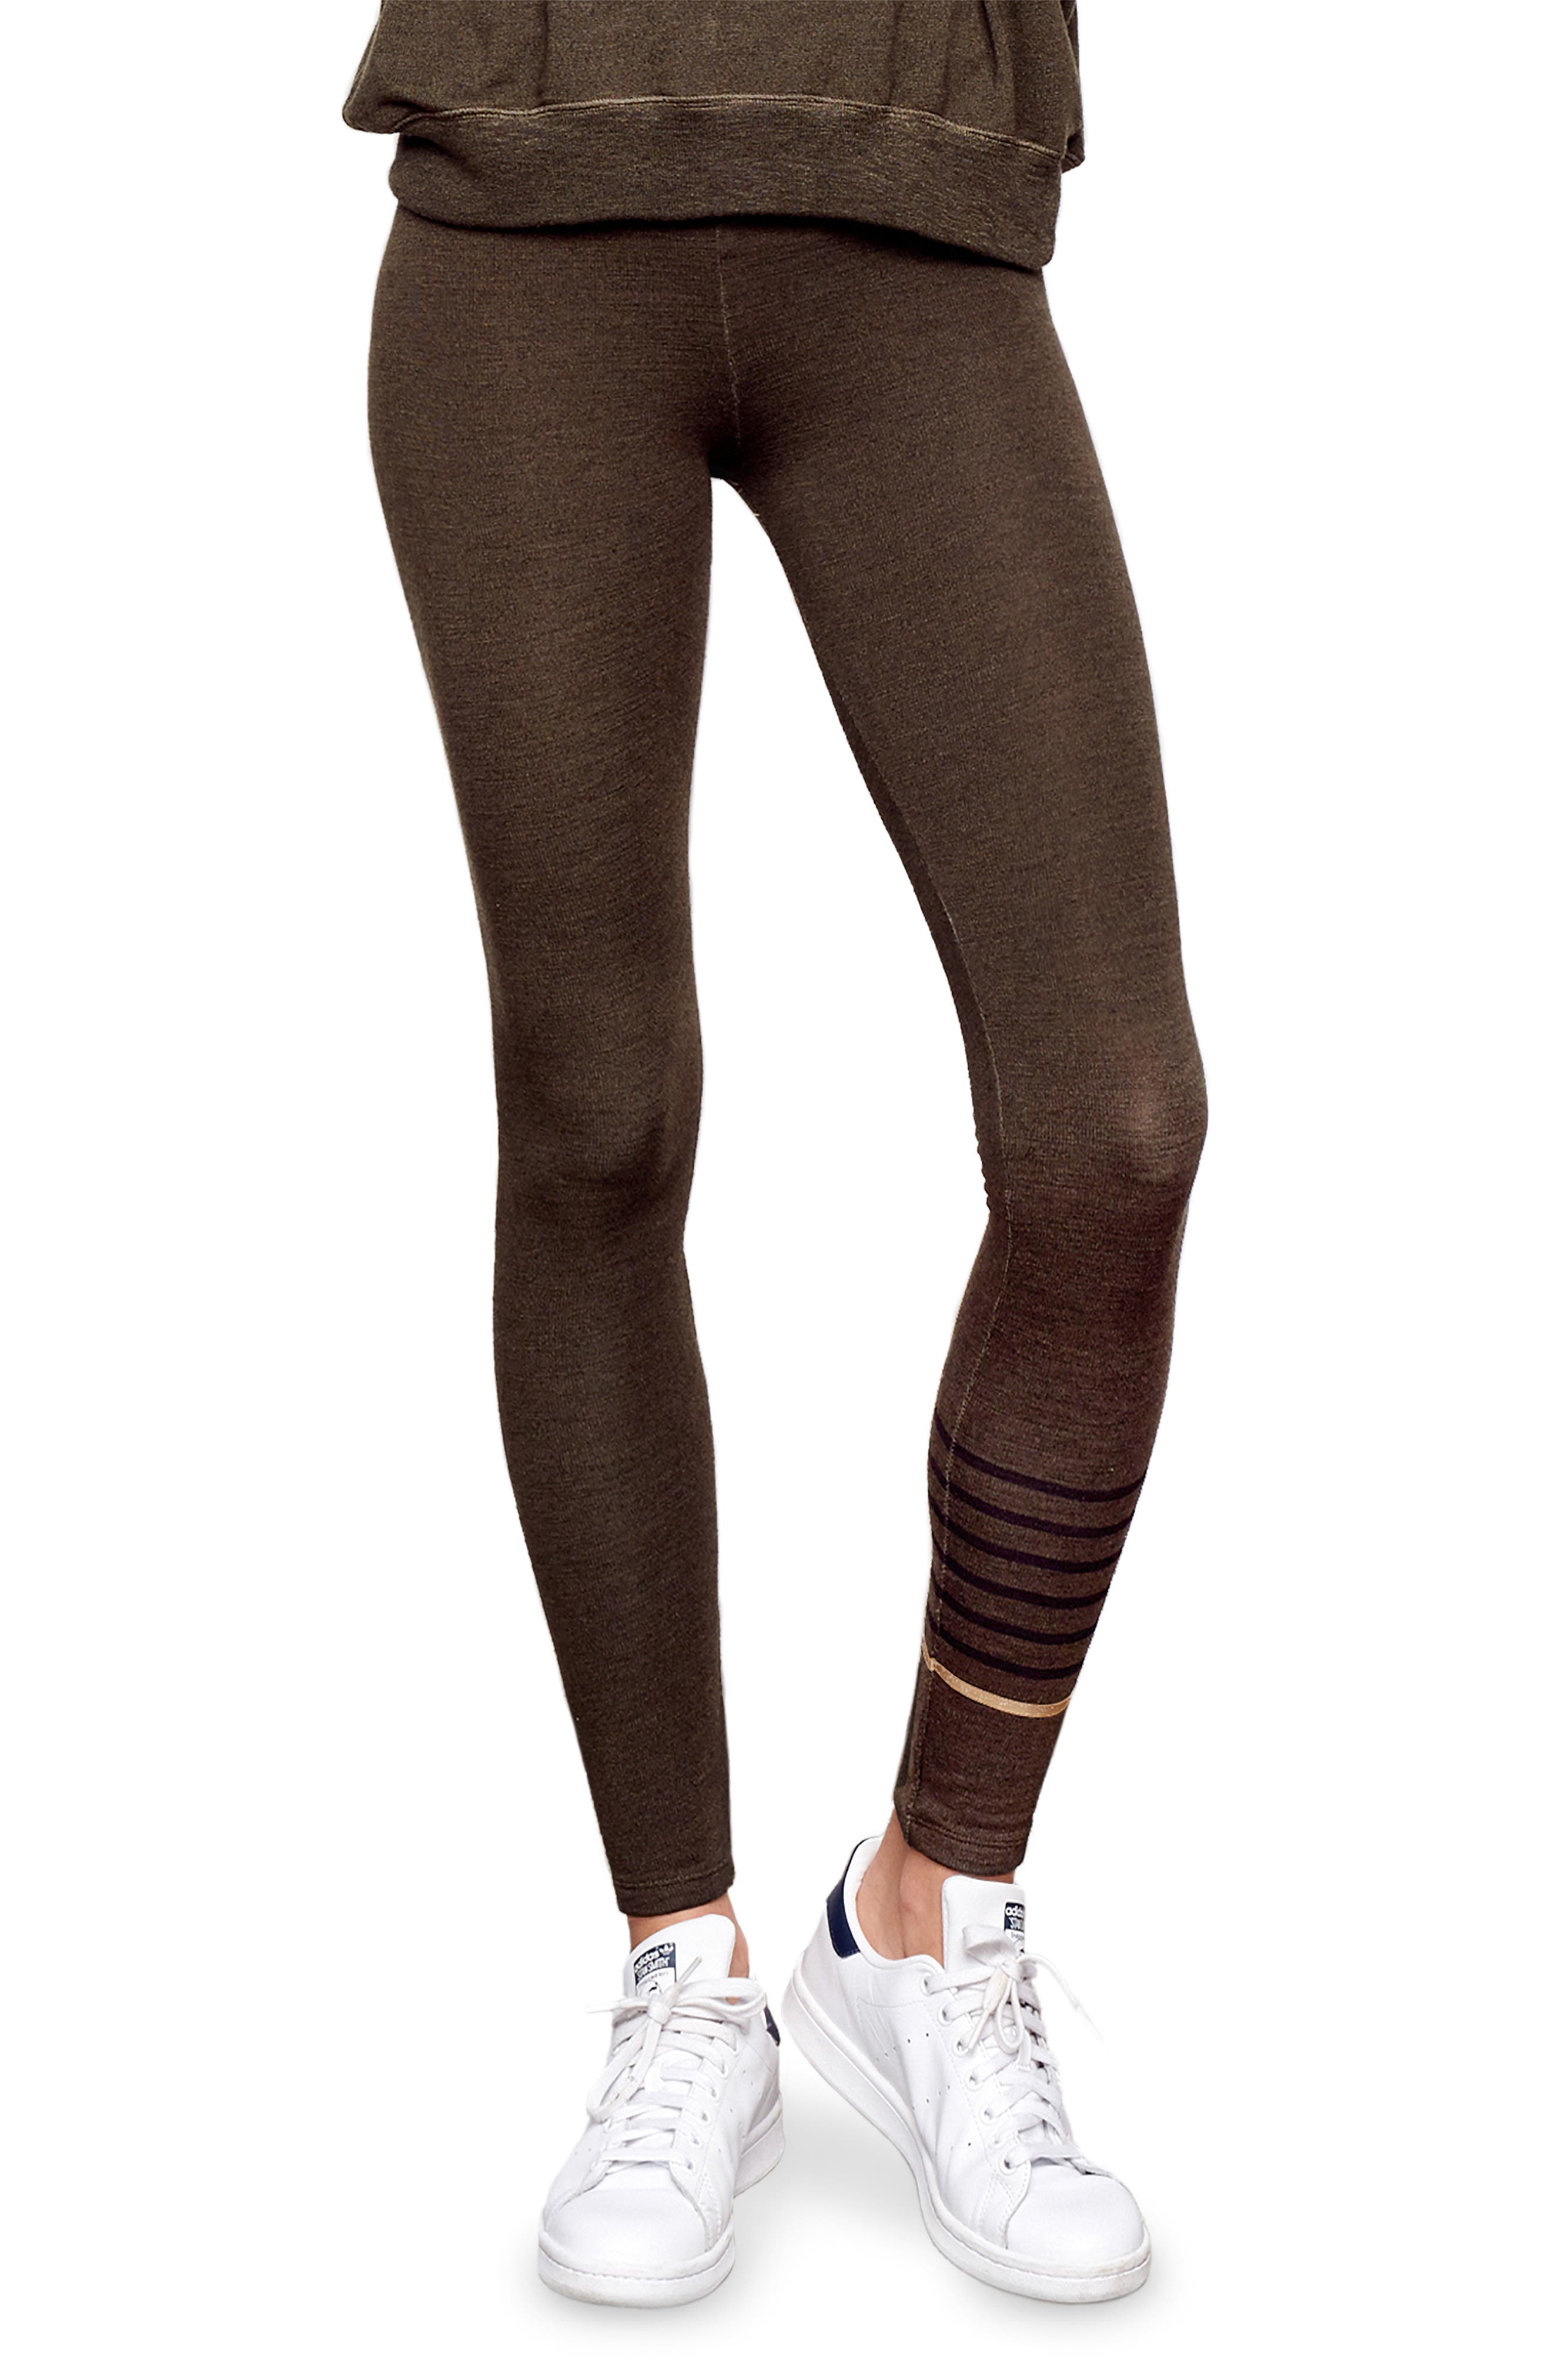 Stripe Yoga Pants,                             Main thumbnail 1, color,                             301